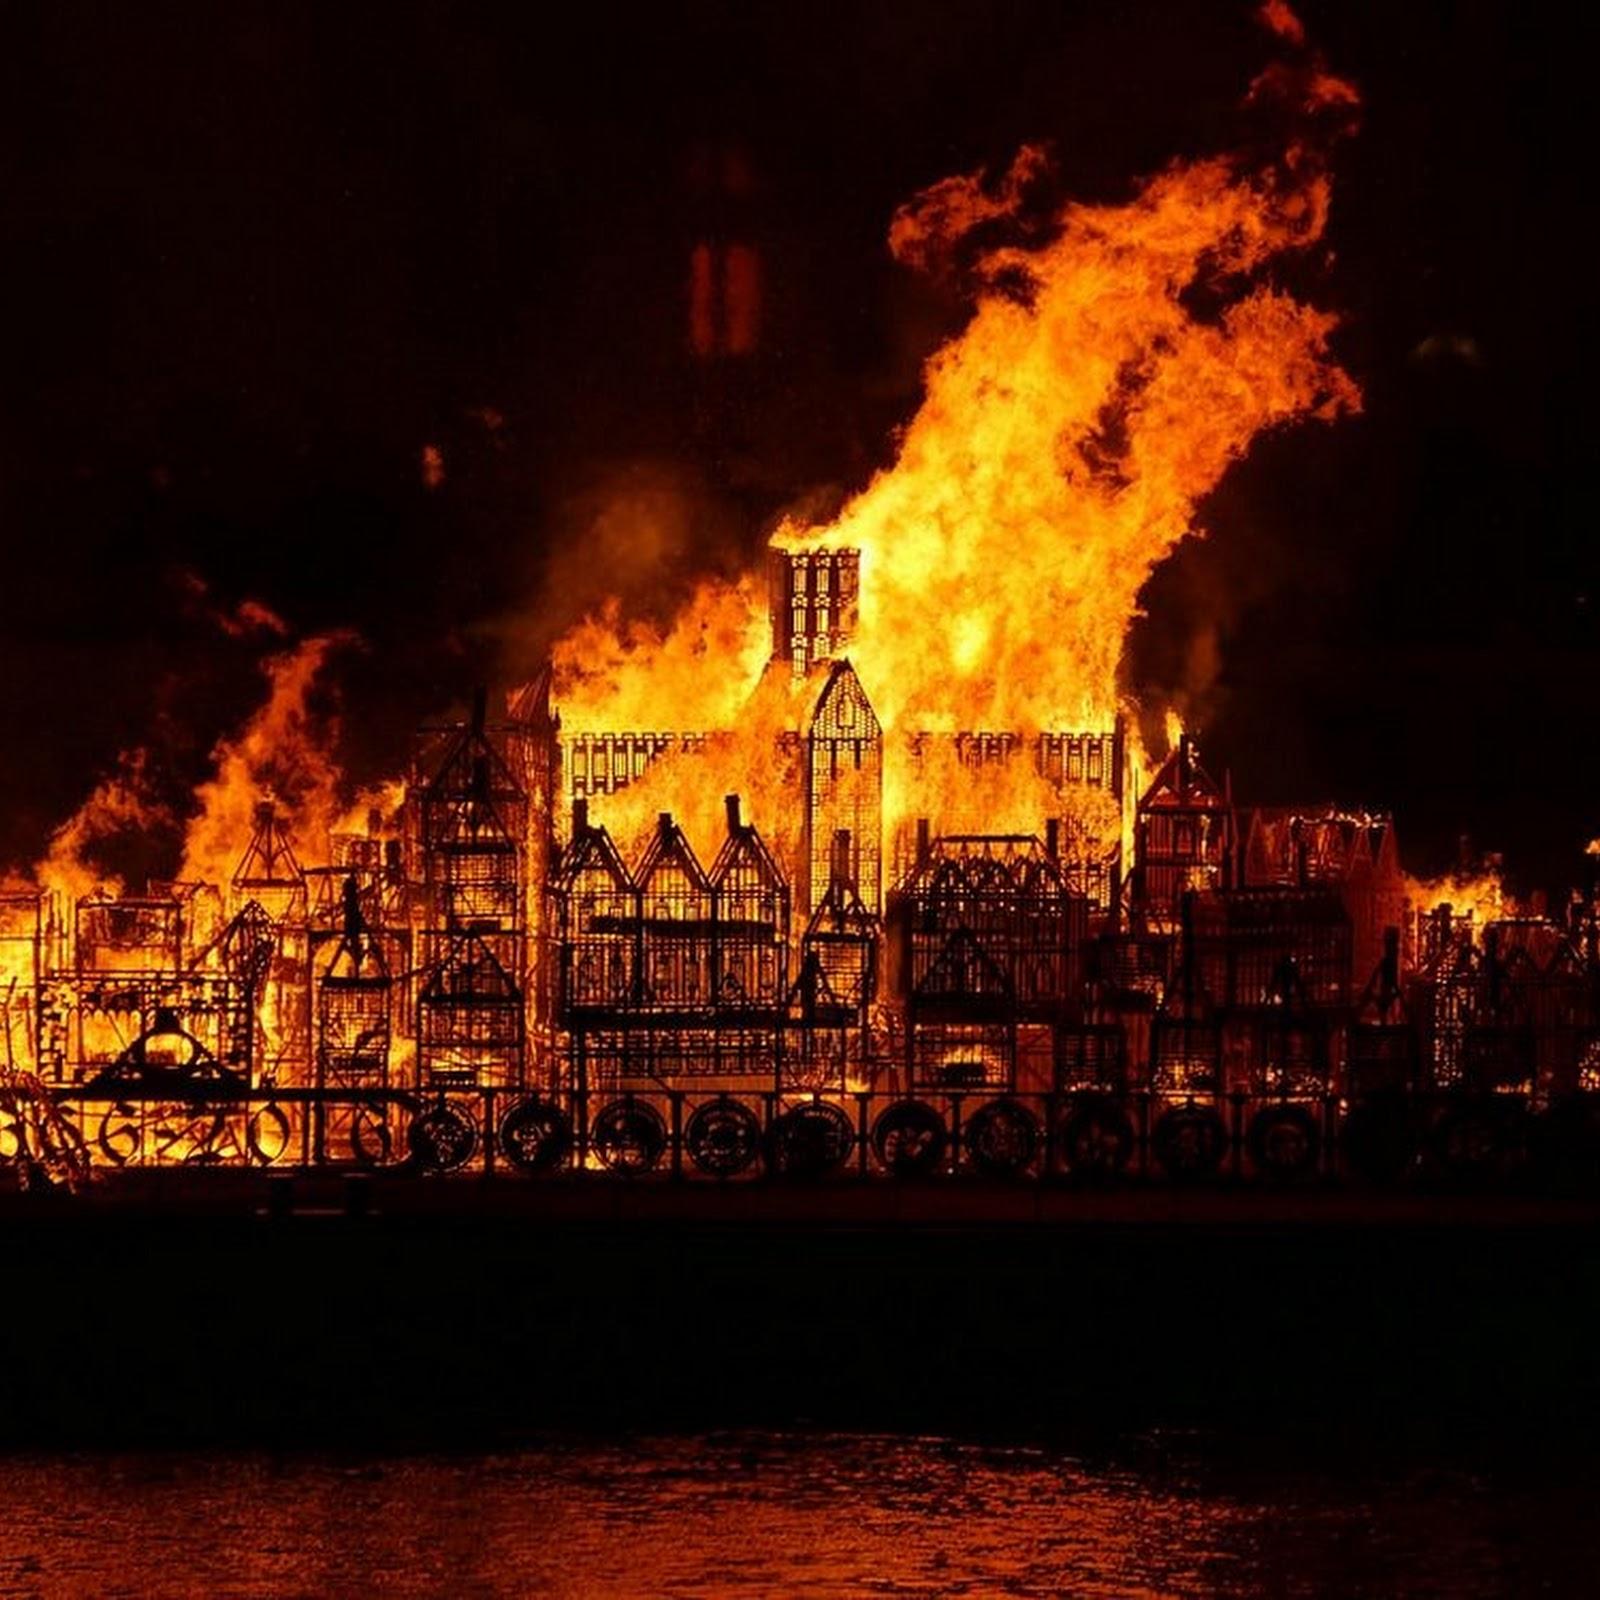 Londoners 'Celebrate' Great Fire By Setting Wooden Model on Fire